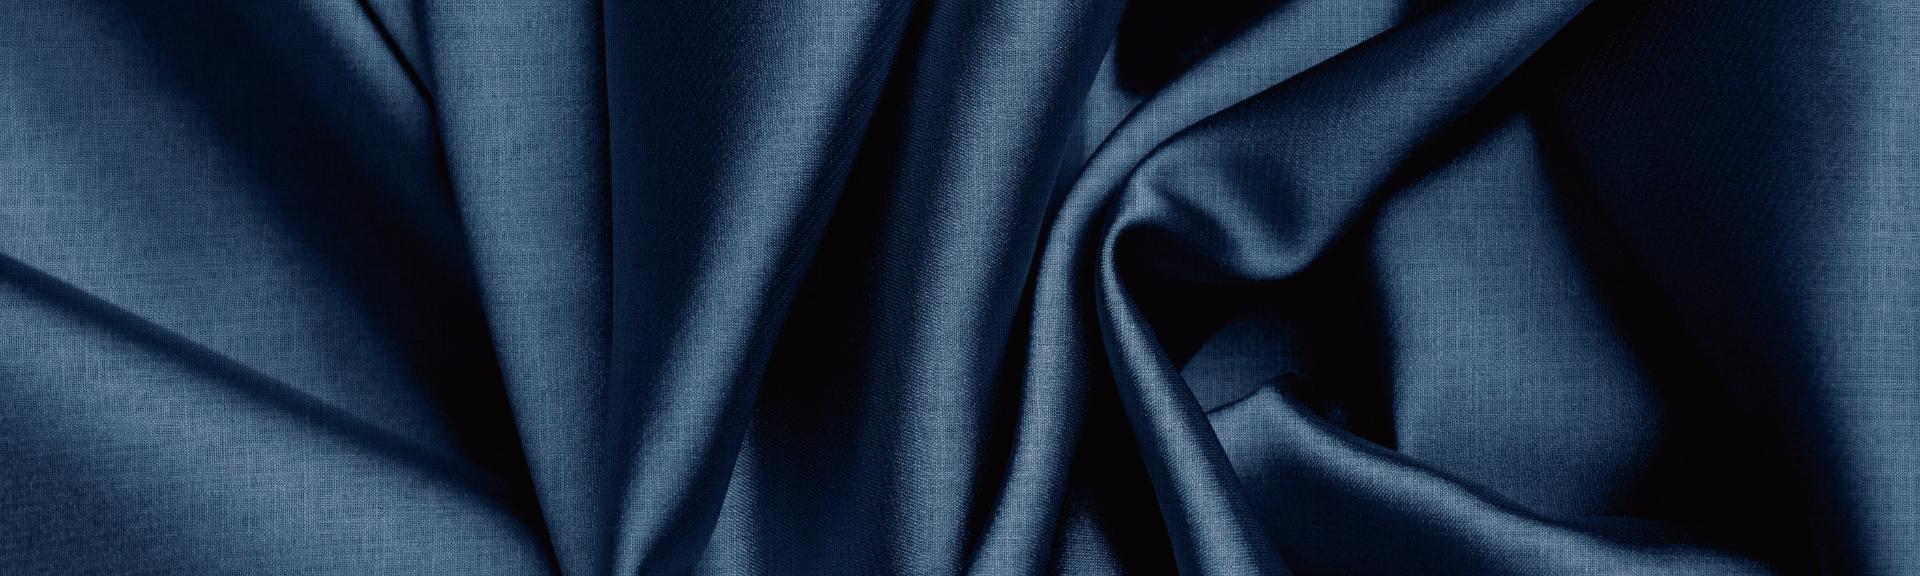 Clothing & Textile